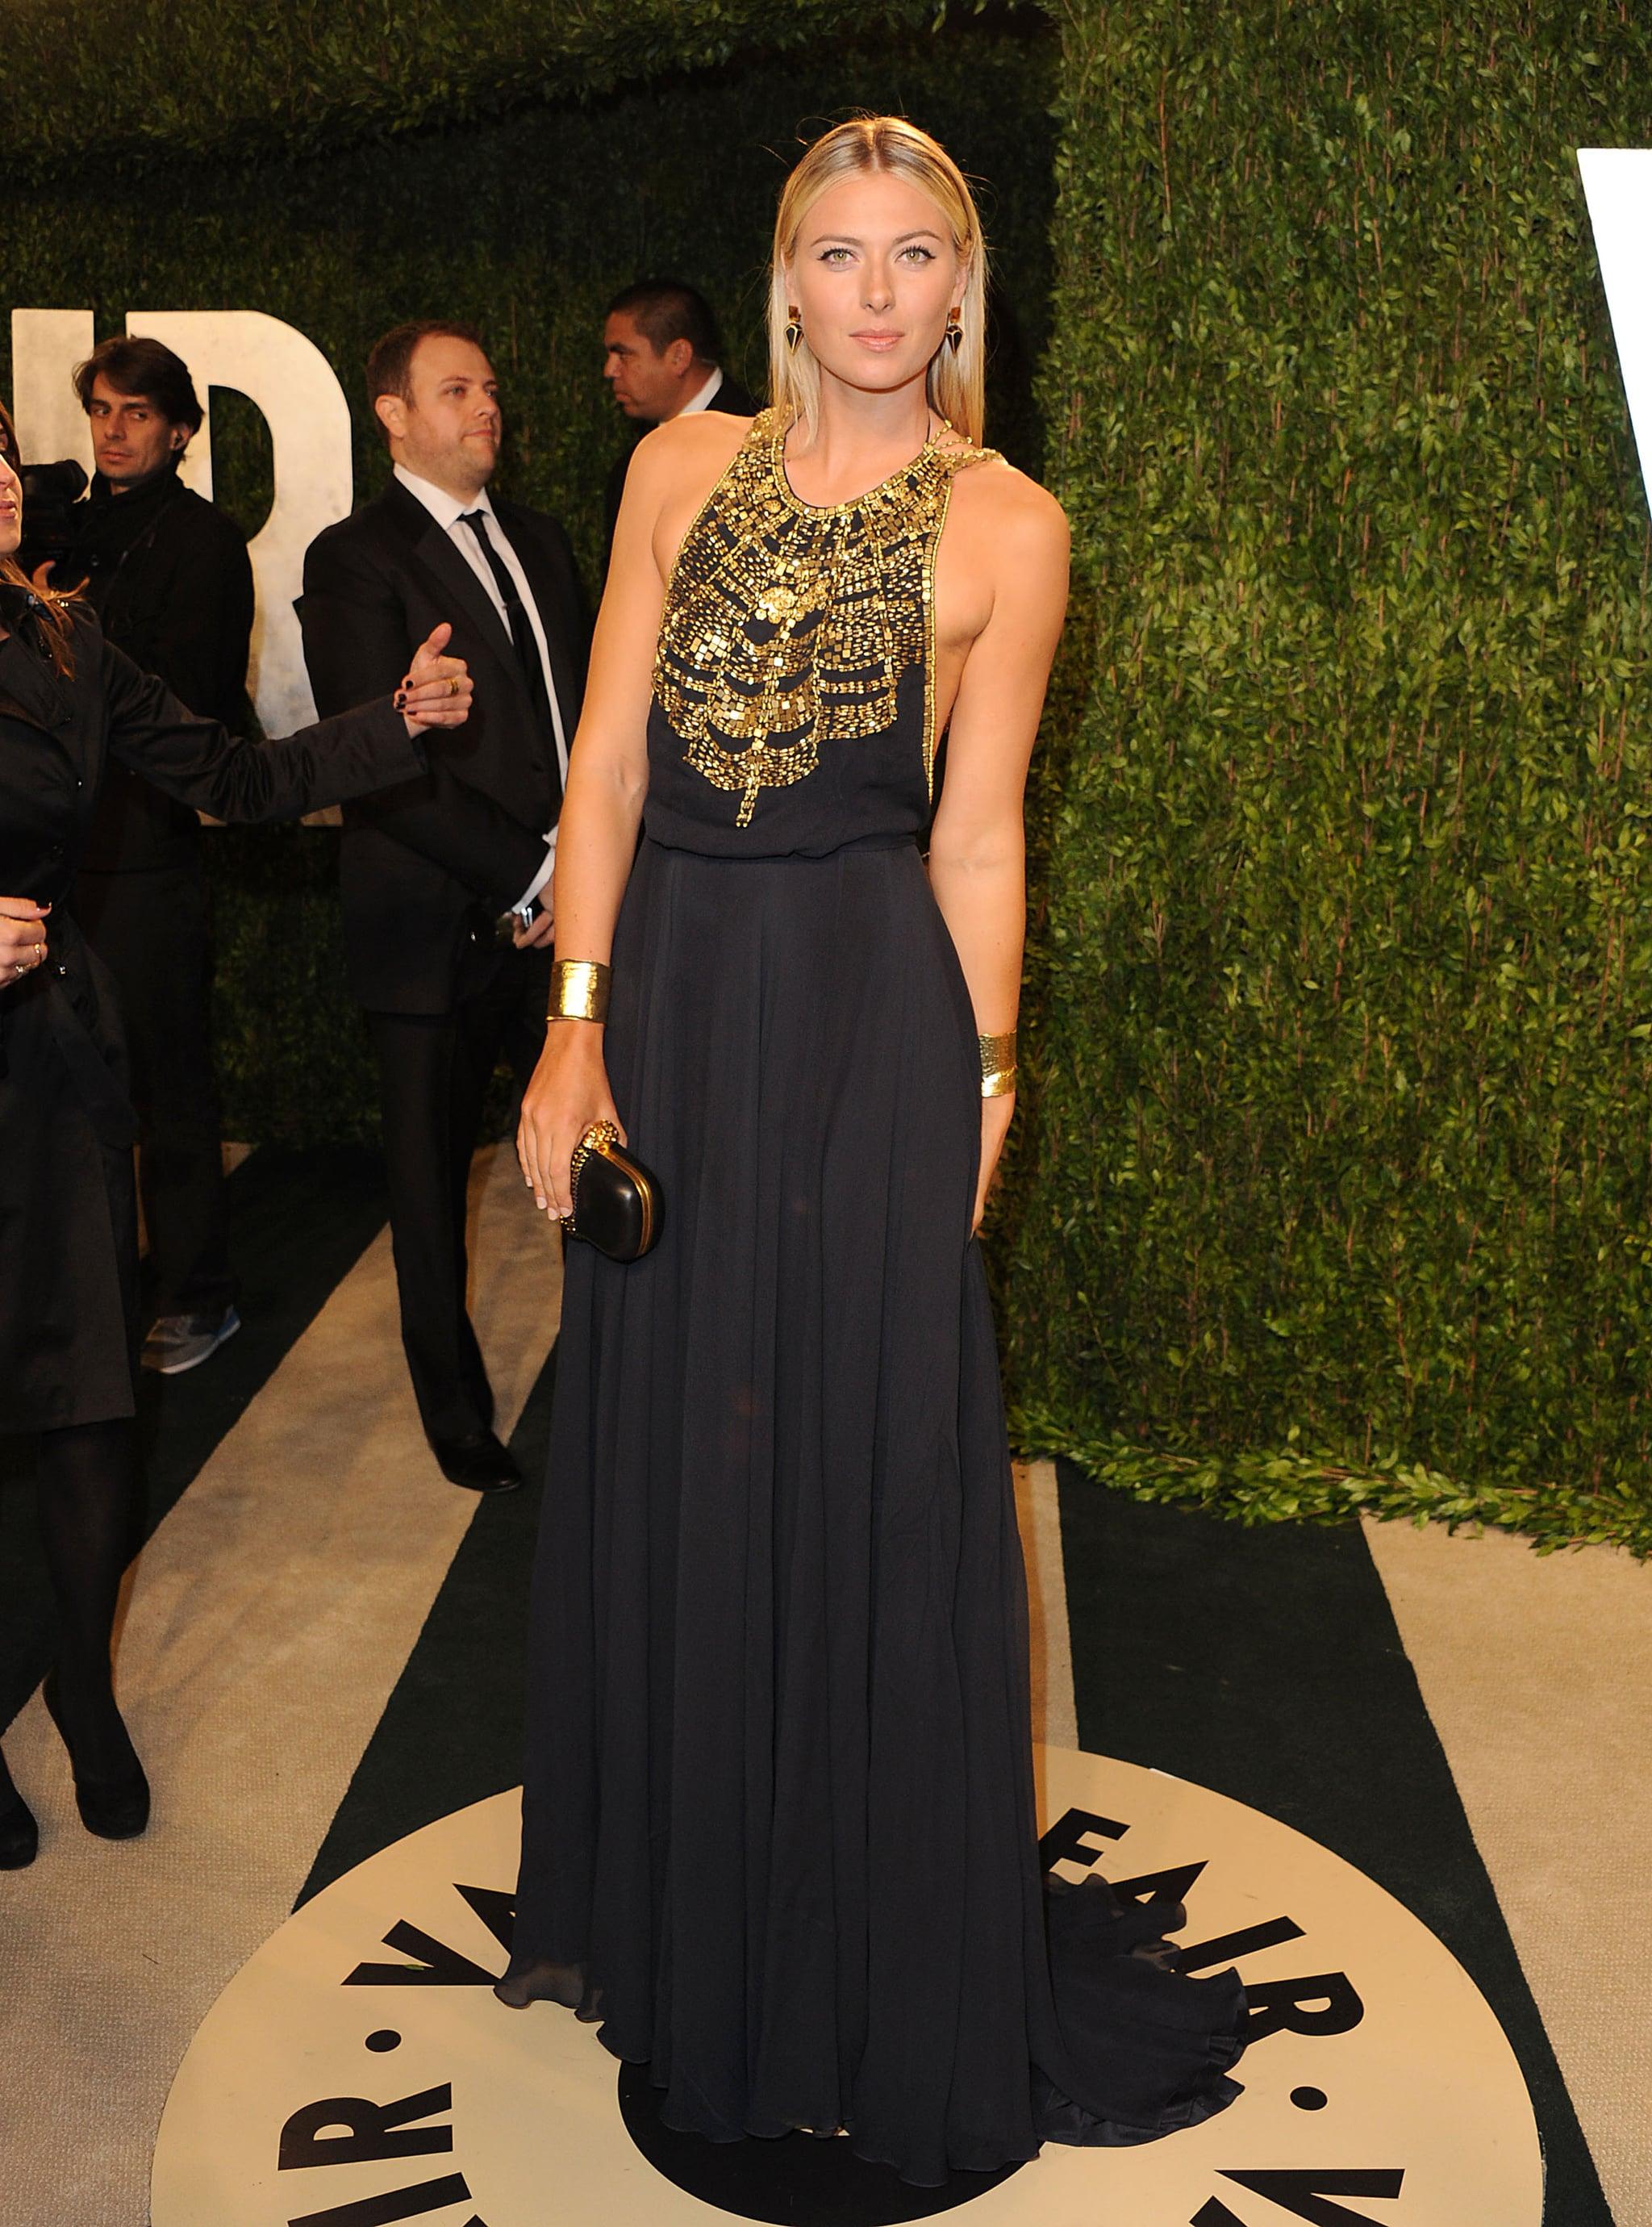 Maria Sharapova: Six Feet, Two Inches